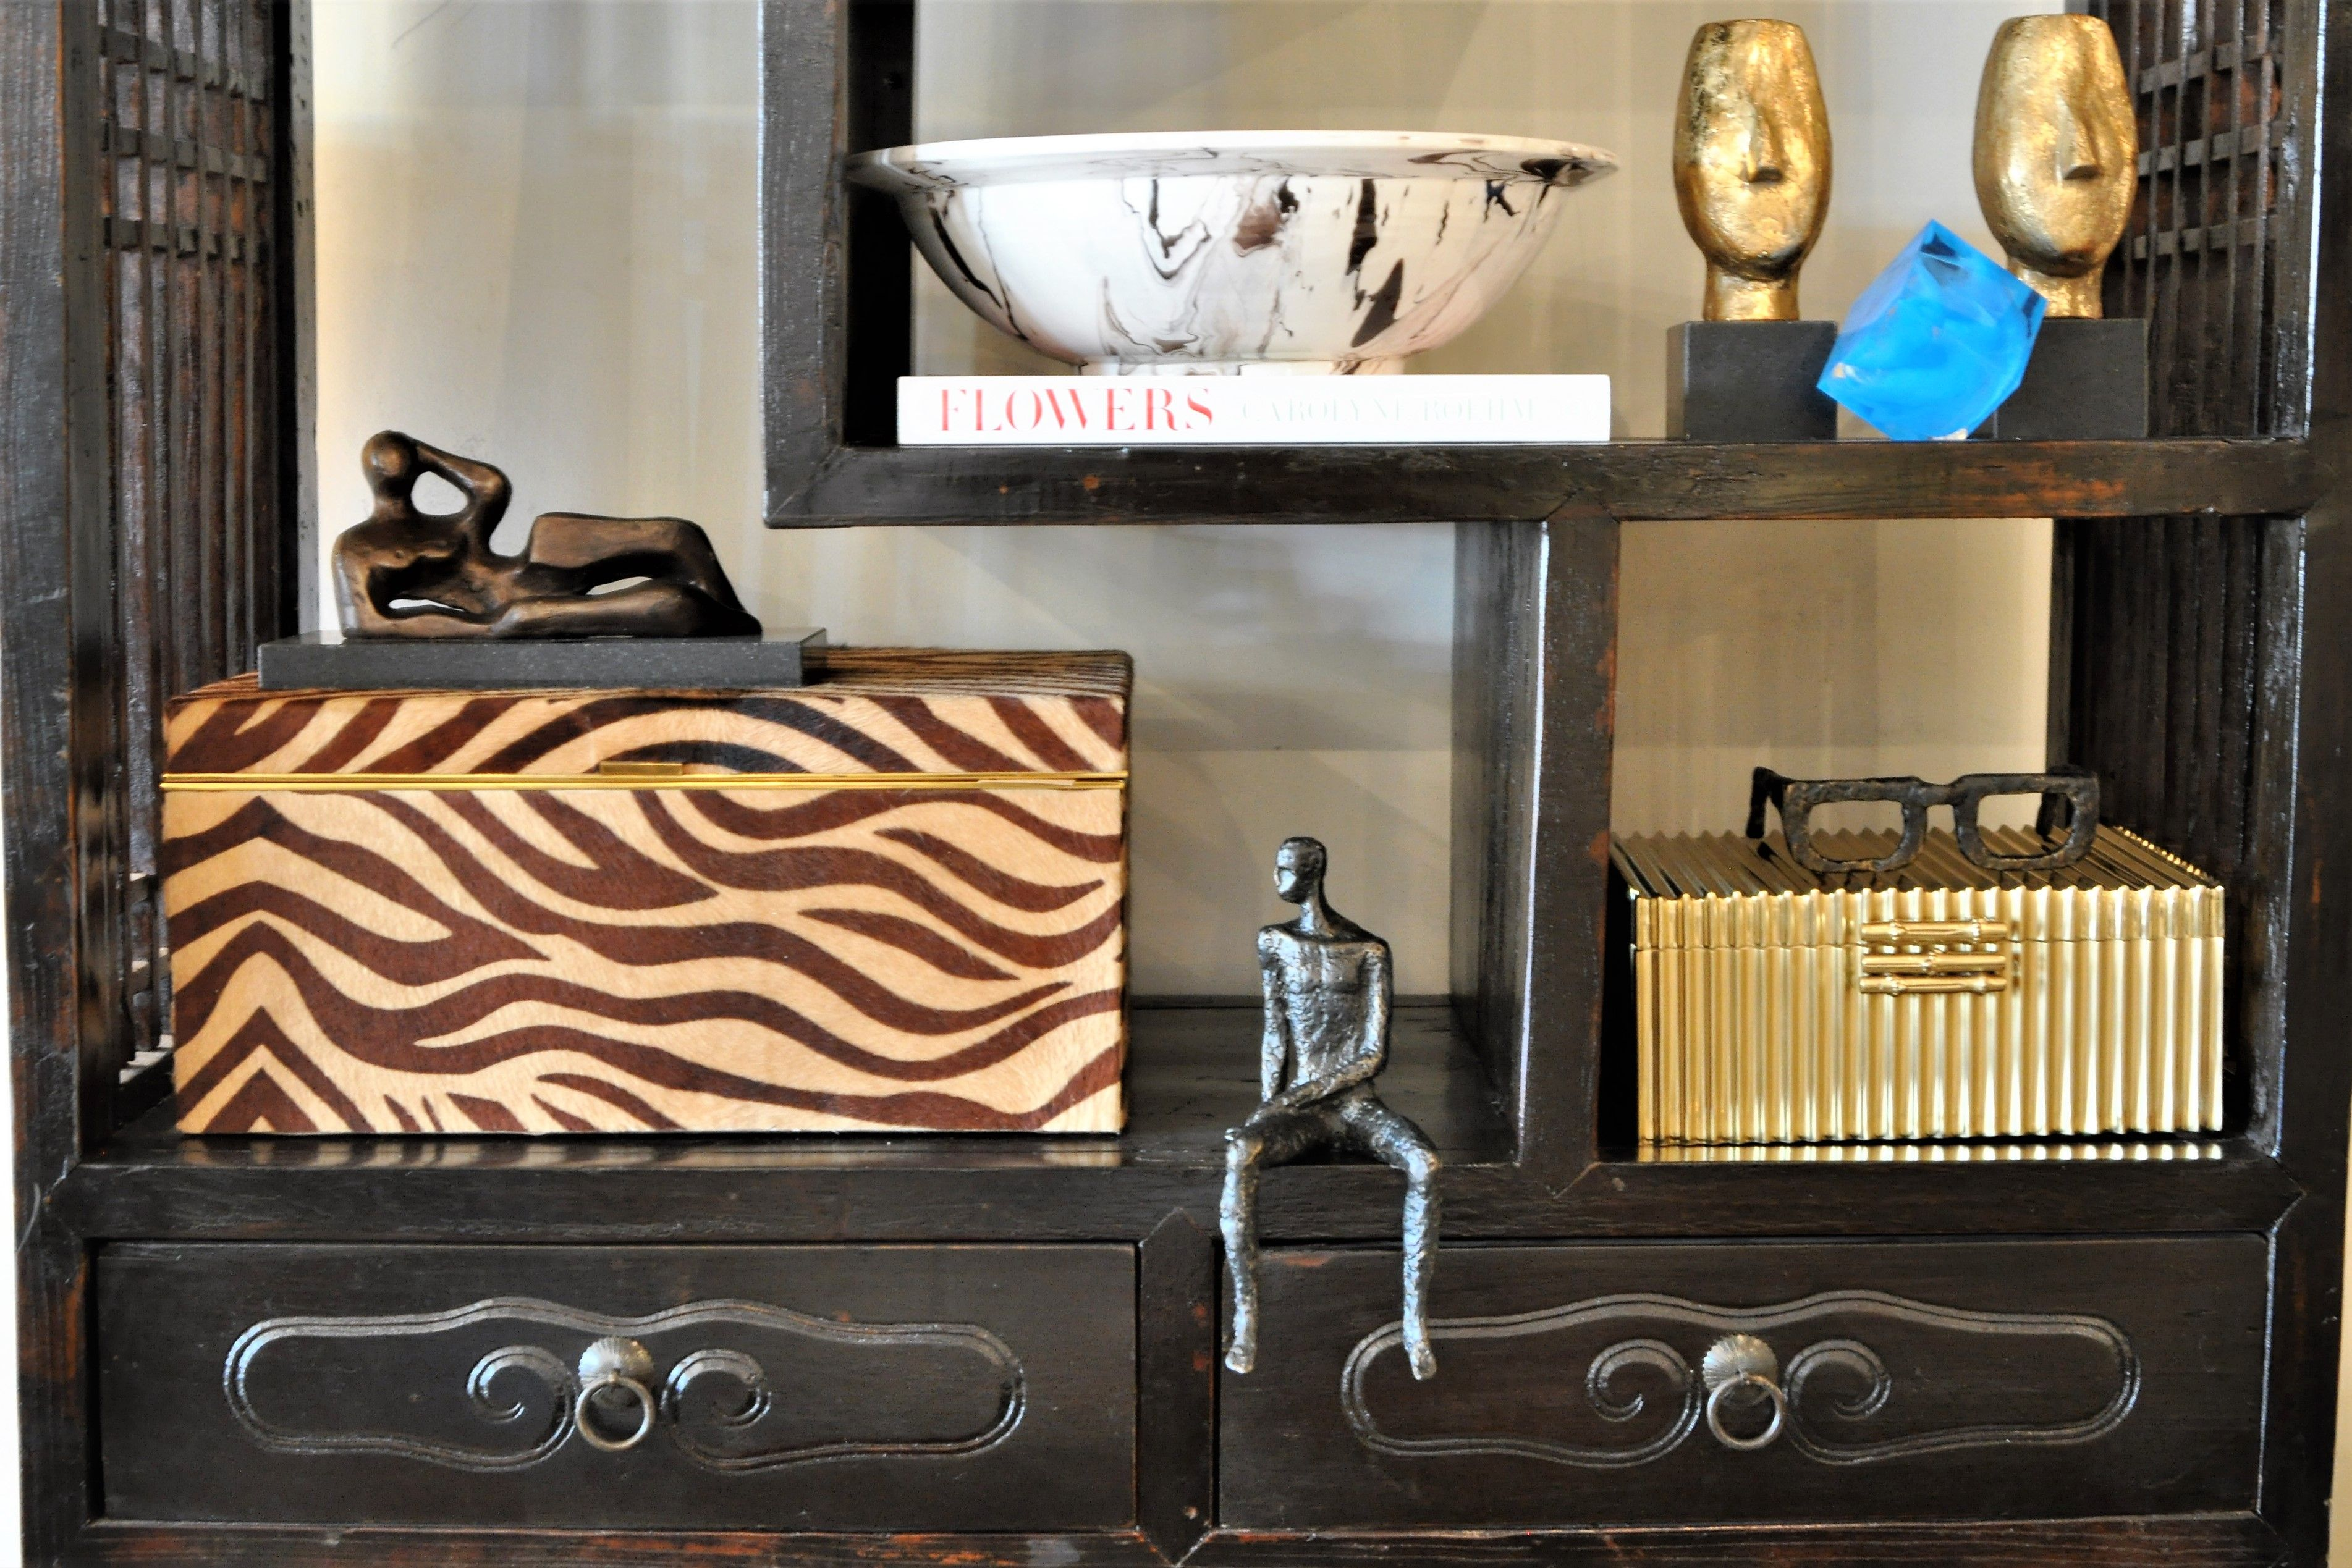 Shelf decor at Mecox NYC #interiordesign #home #decor #design #MecoxGardens #dogsofmecox